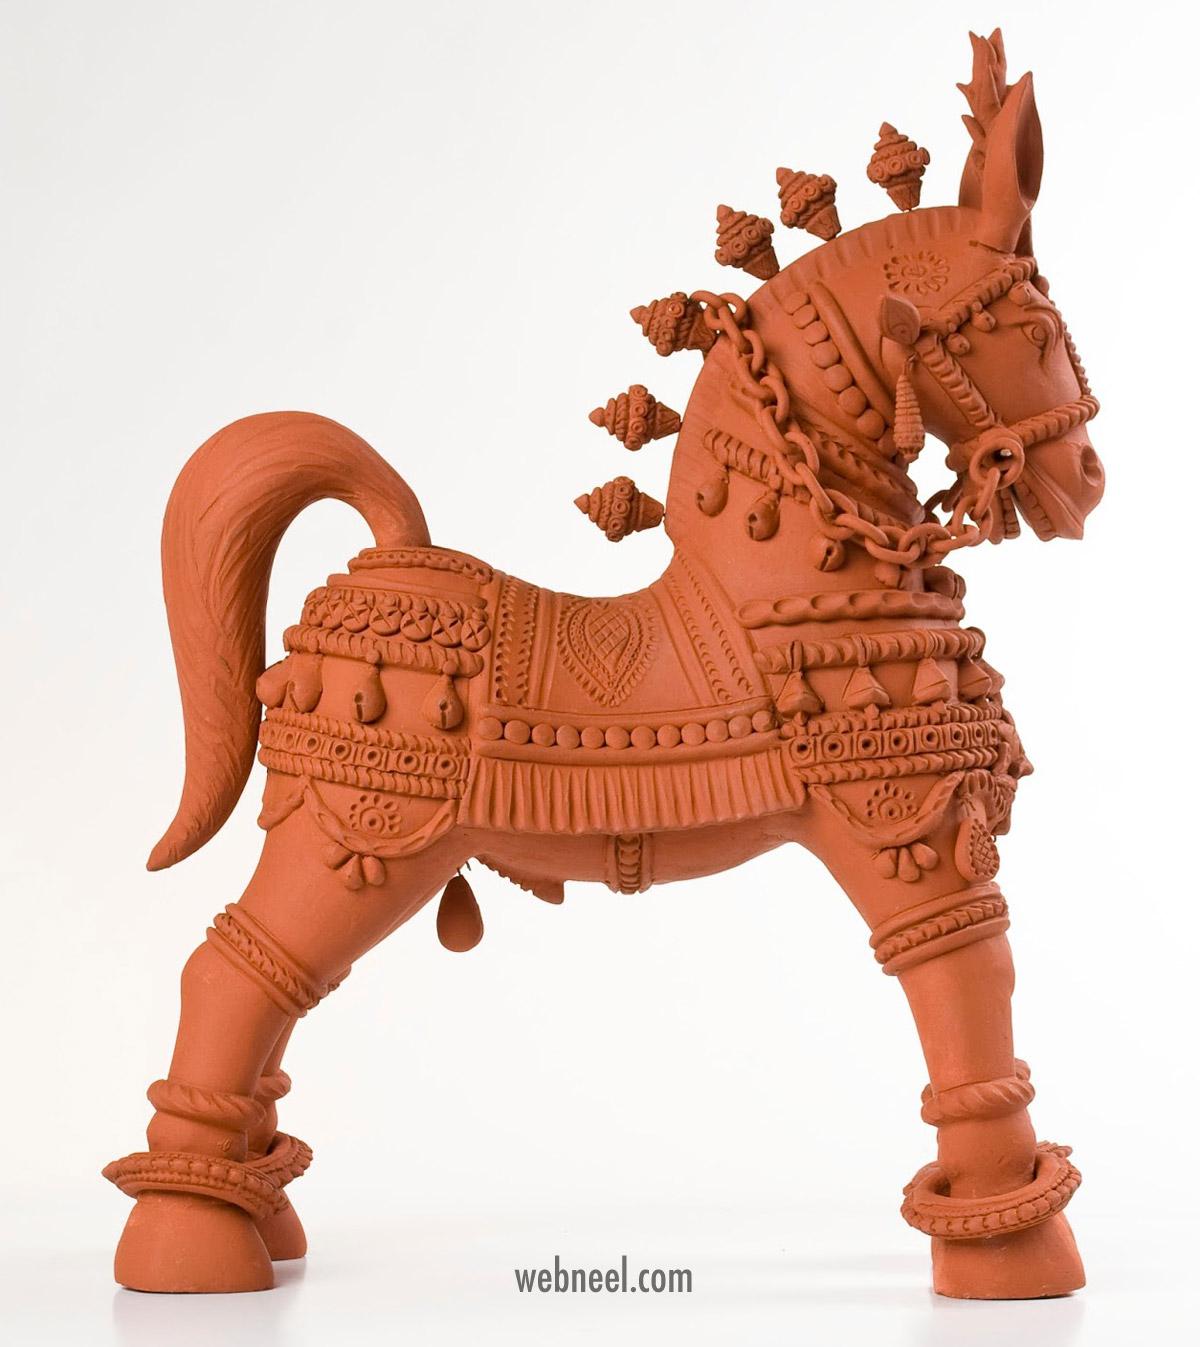 terracotta sculpture horse